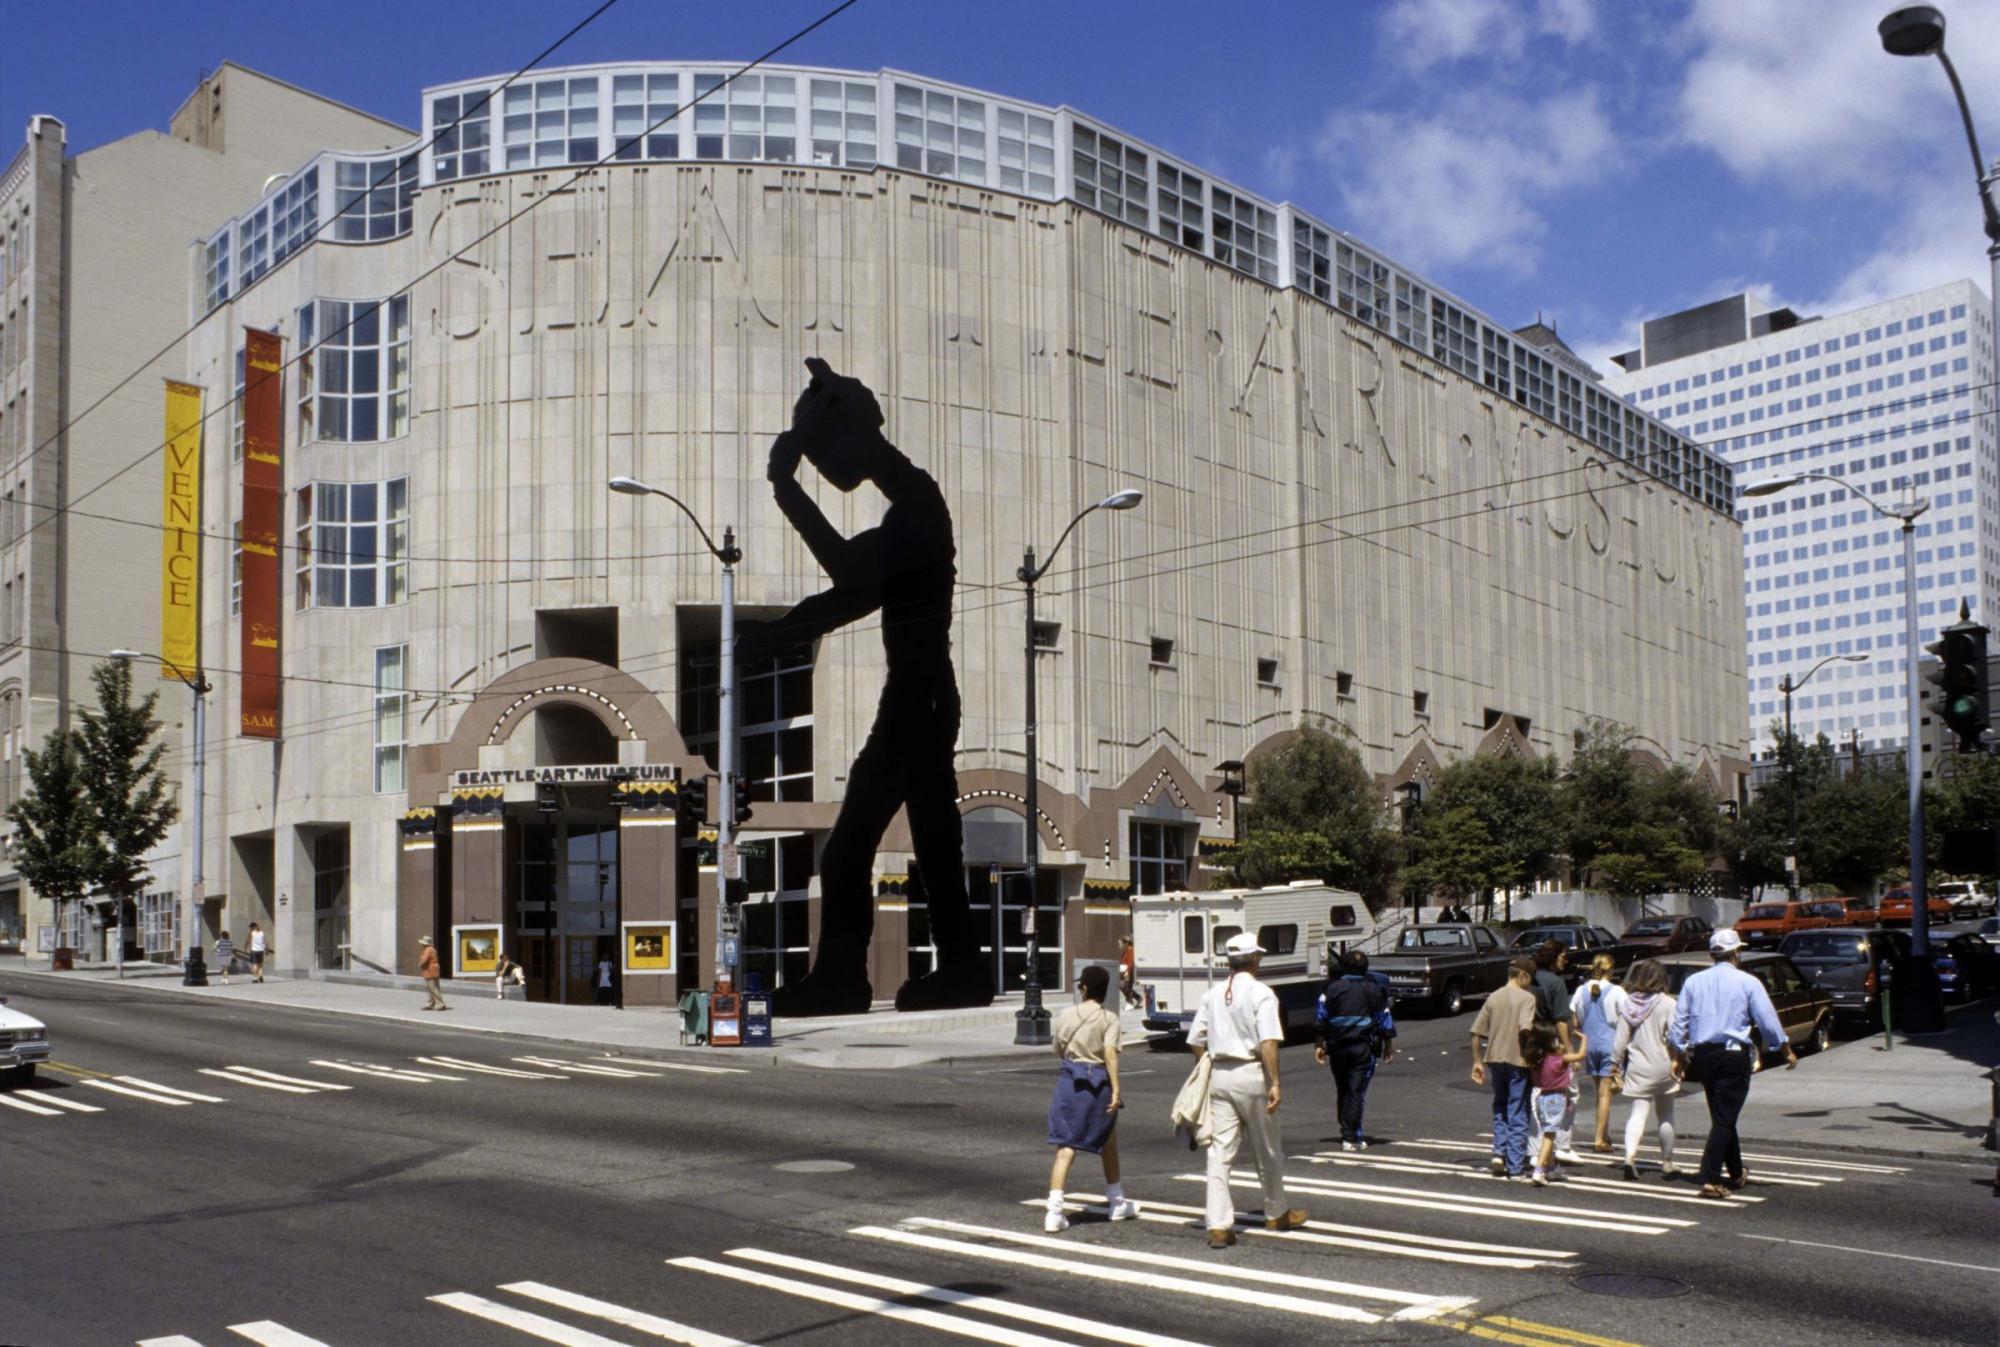 Seattle Art Museum | Sartle - Rogue Art History